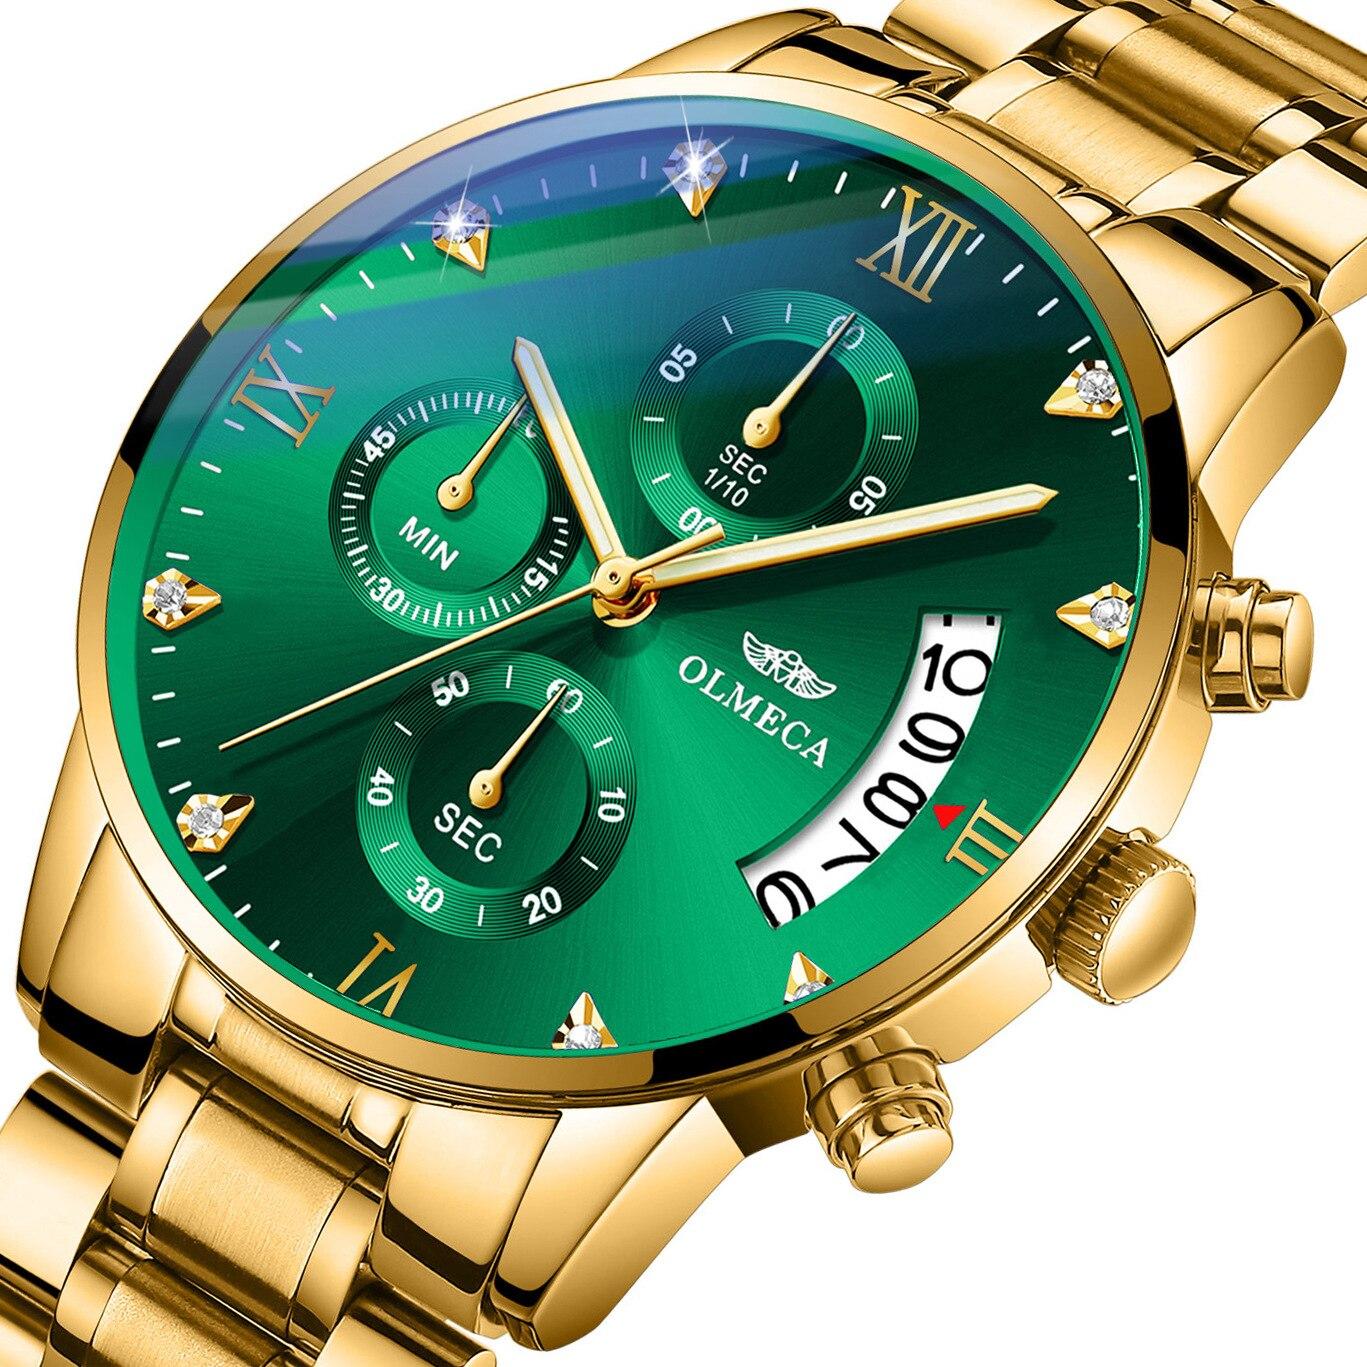 OLMECA Men Watch Top Brand Luxury Waterproof Stainless Steel Fashion Complete Calendar Wrist Watches Chronograph Clock Man Hour